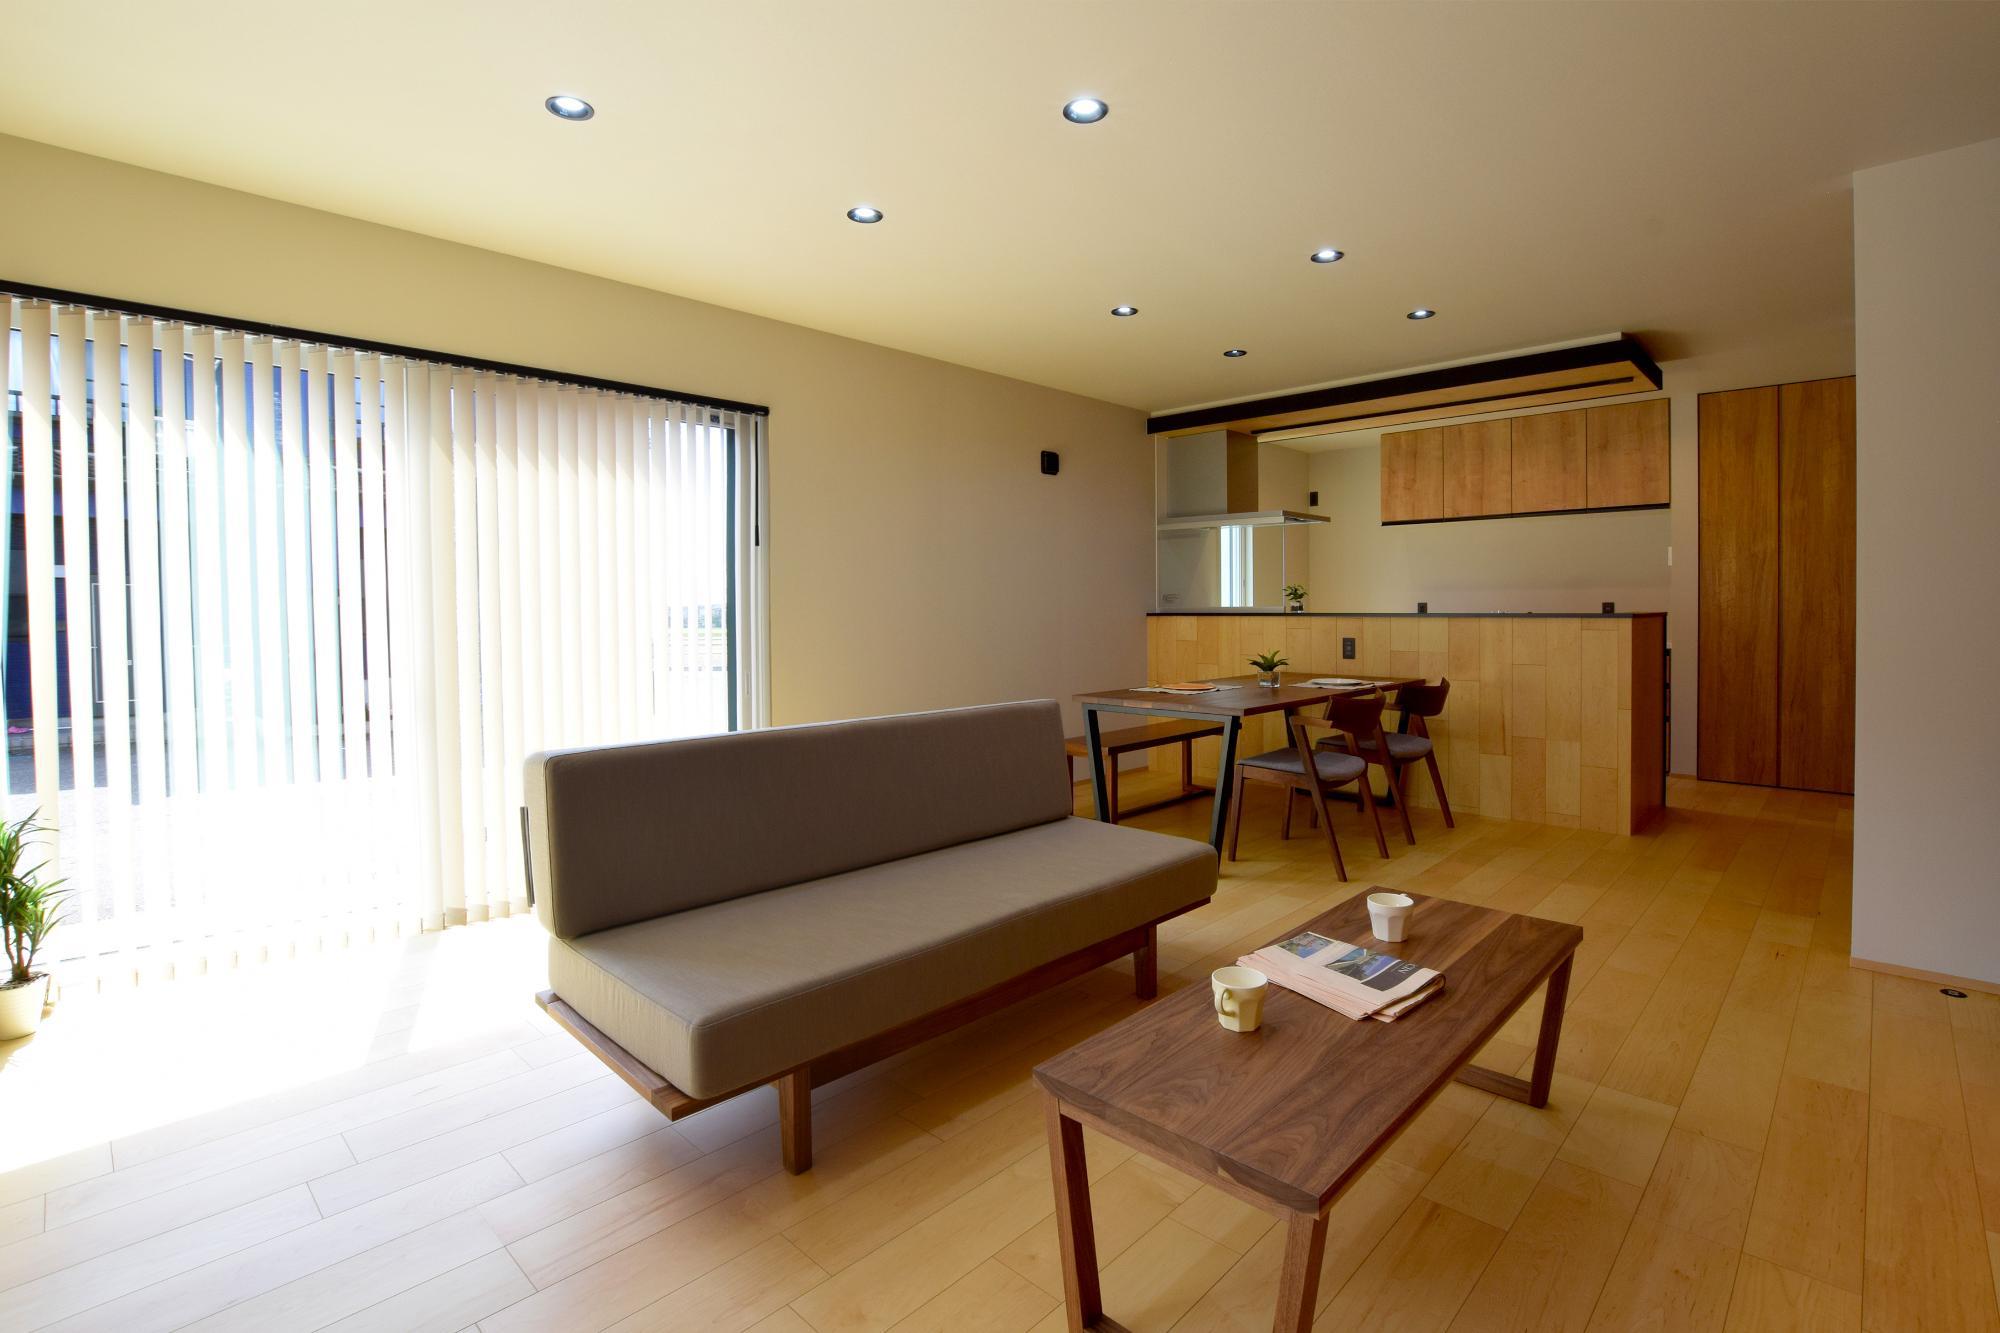 DETAIL HOME(ディテールホーム)「ハコ型という選択×耐震3の家」のシンプル・ナチュラルなリビング・ダイニングの実例写真